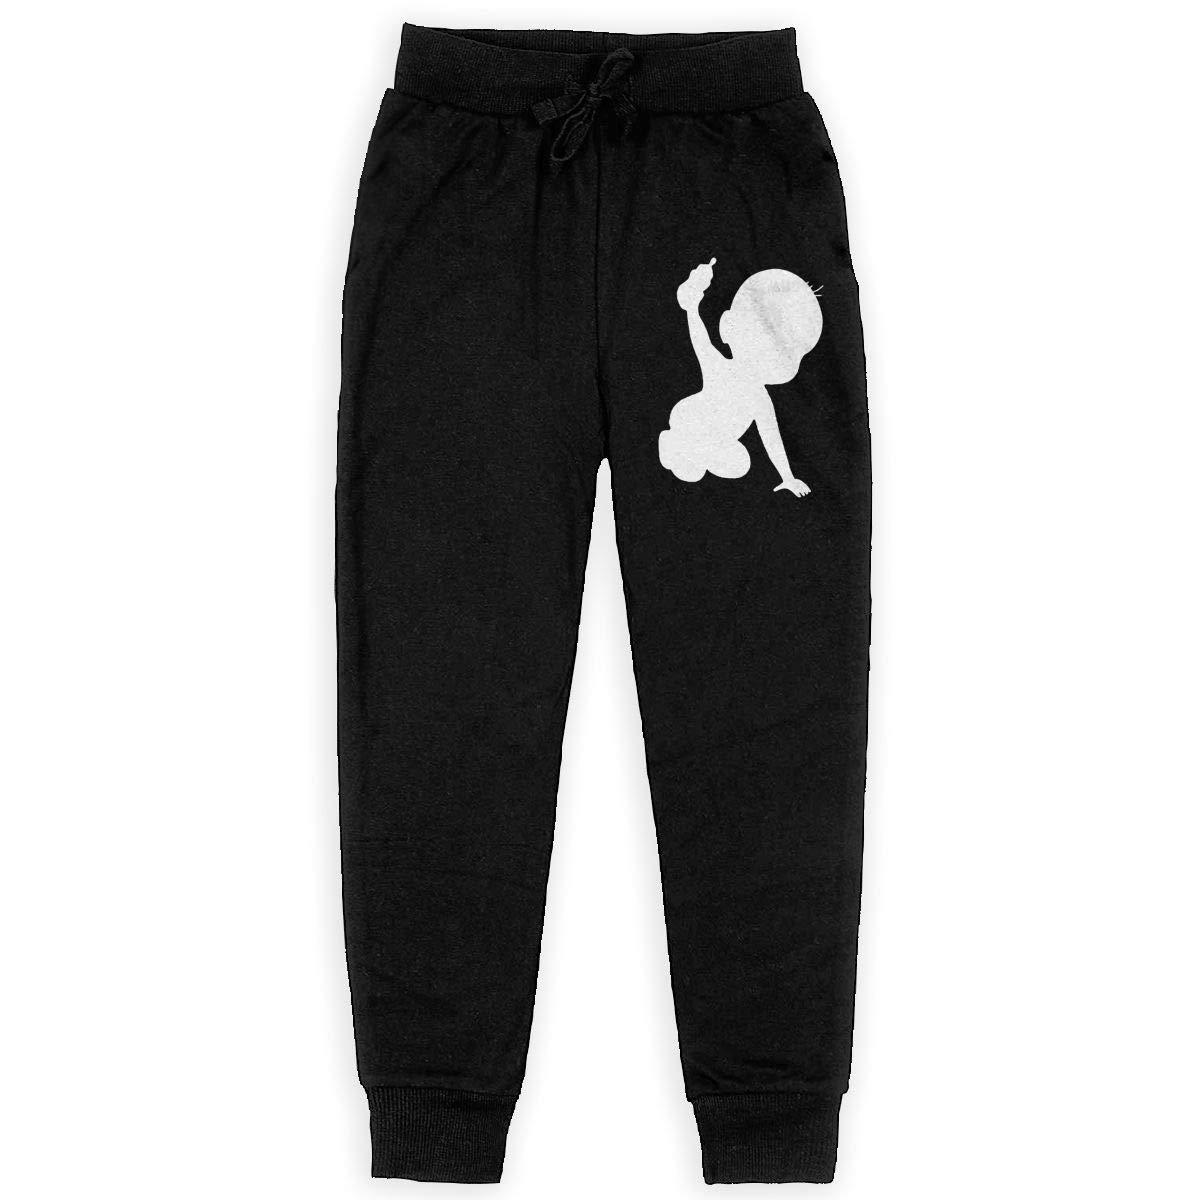 Po0owkw2op Toddler Teenage Trousers